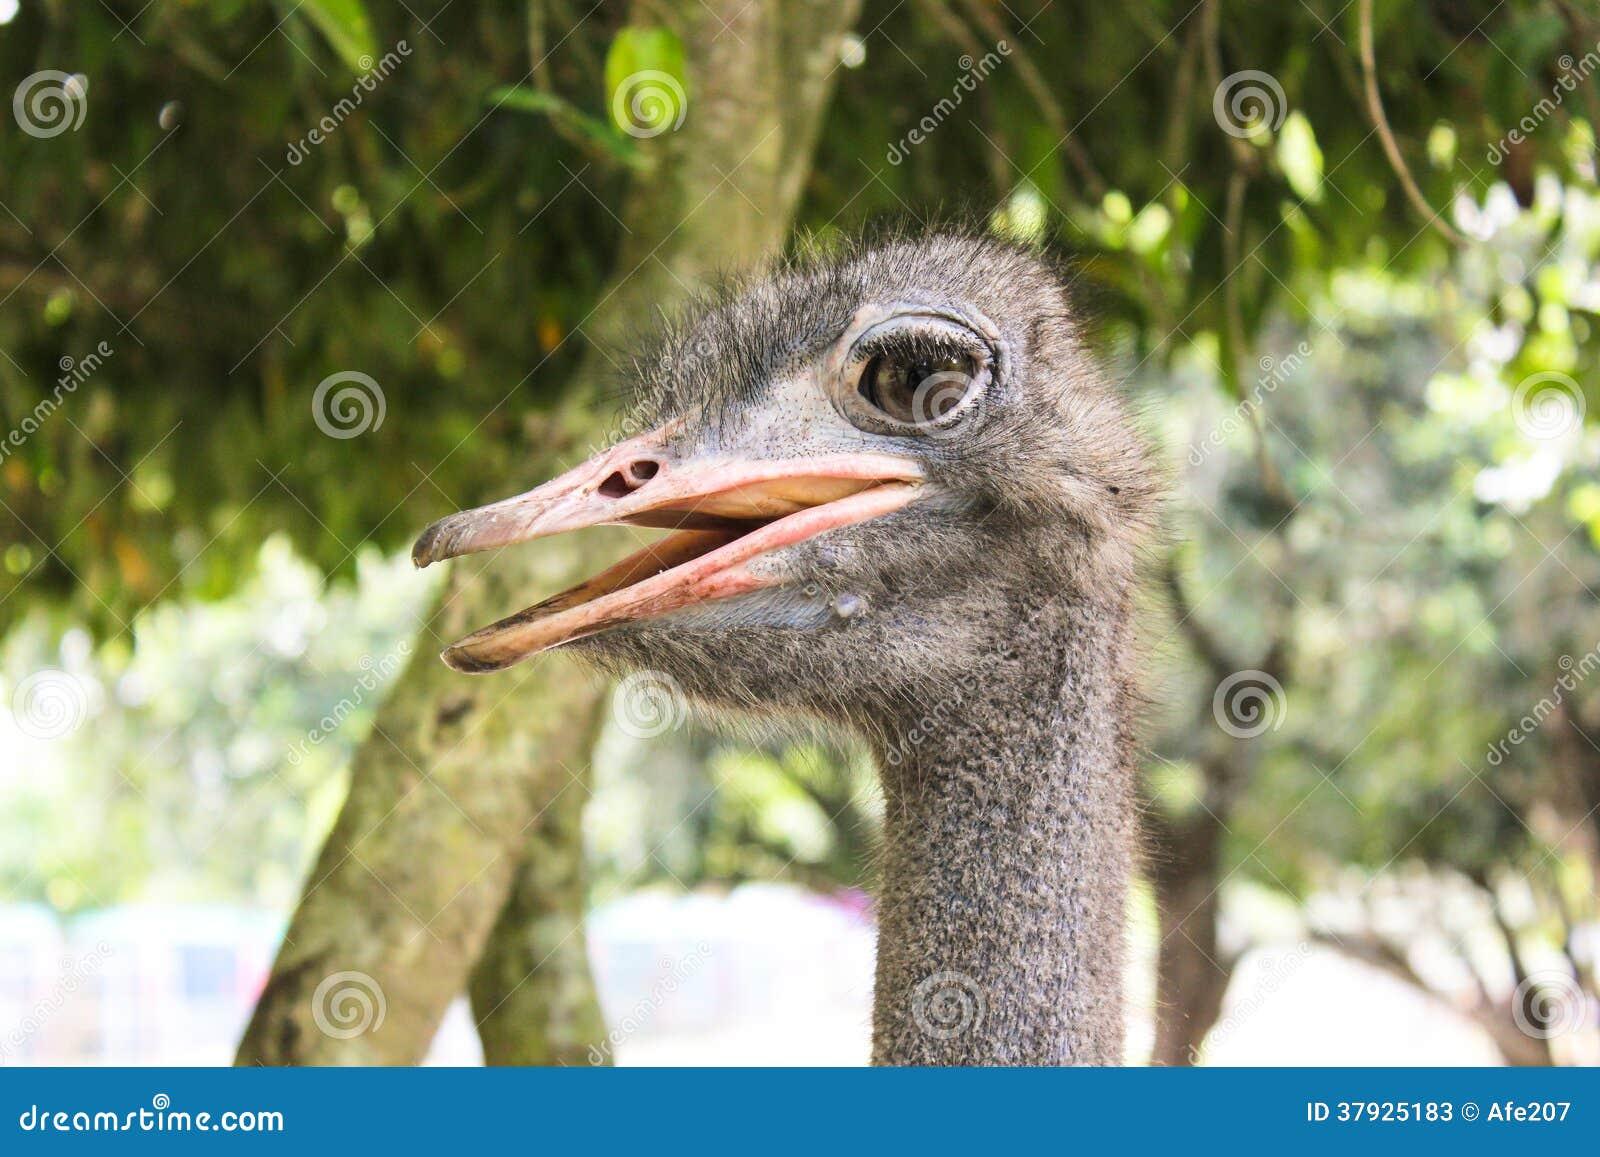 Голова страуса портрета конца-вверх